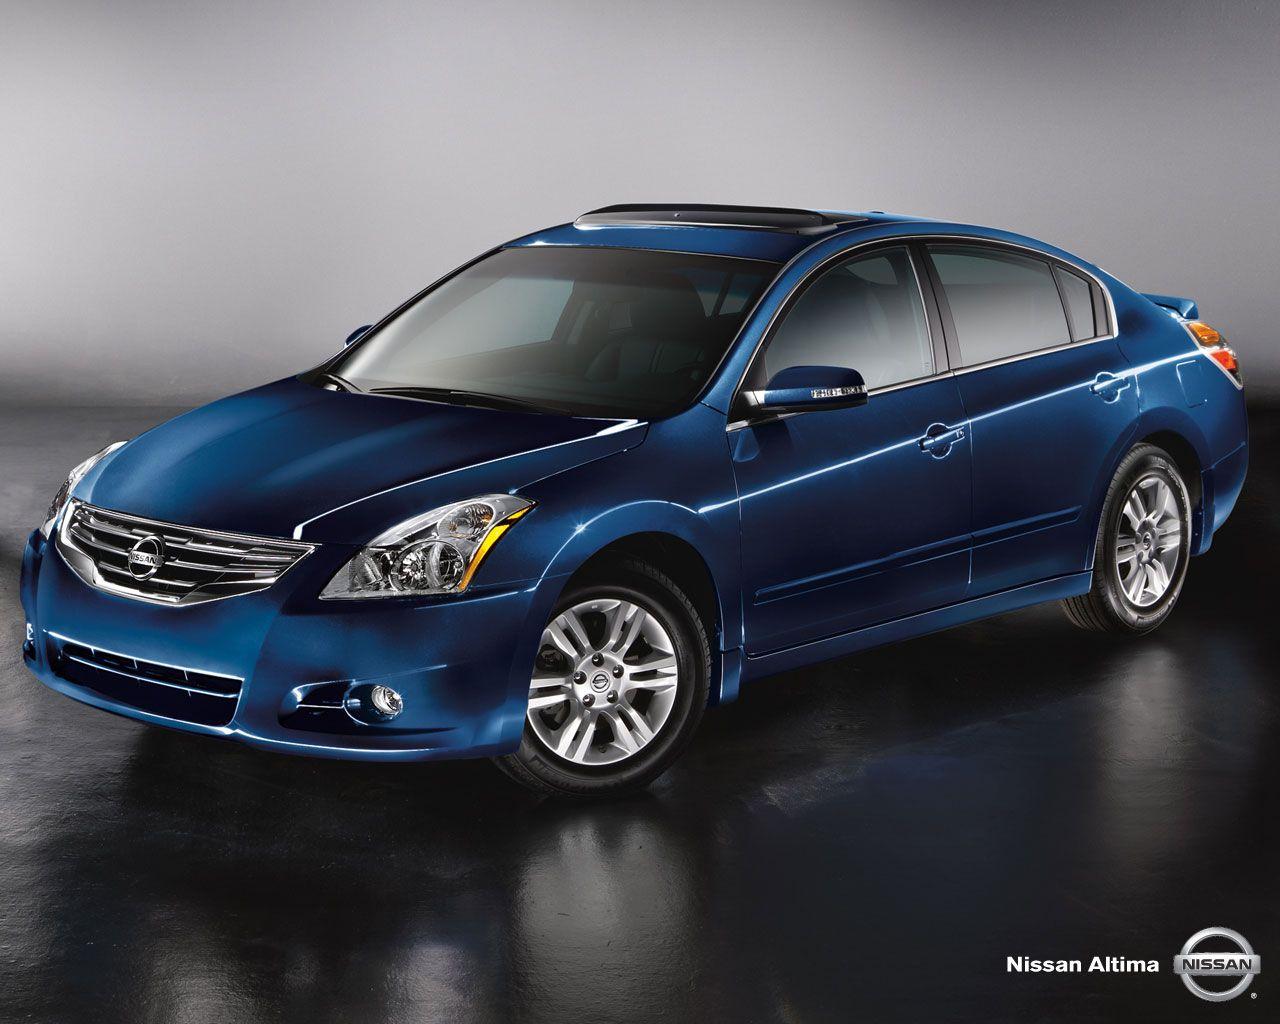 Navy blue 2011 nissan altima cars pinterest nissan altima navy blue 2011 nissan altima vanachro Choice Image